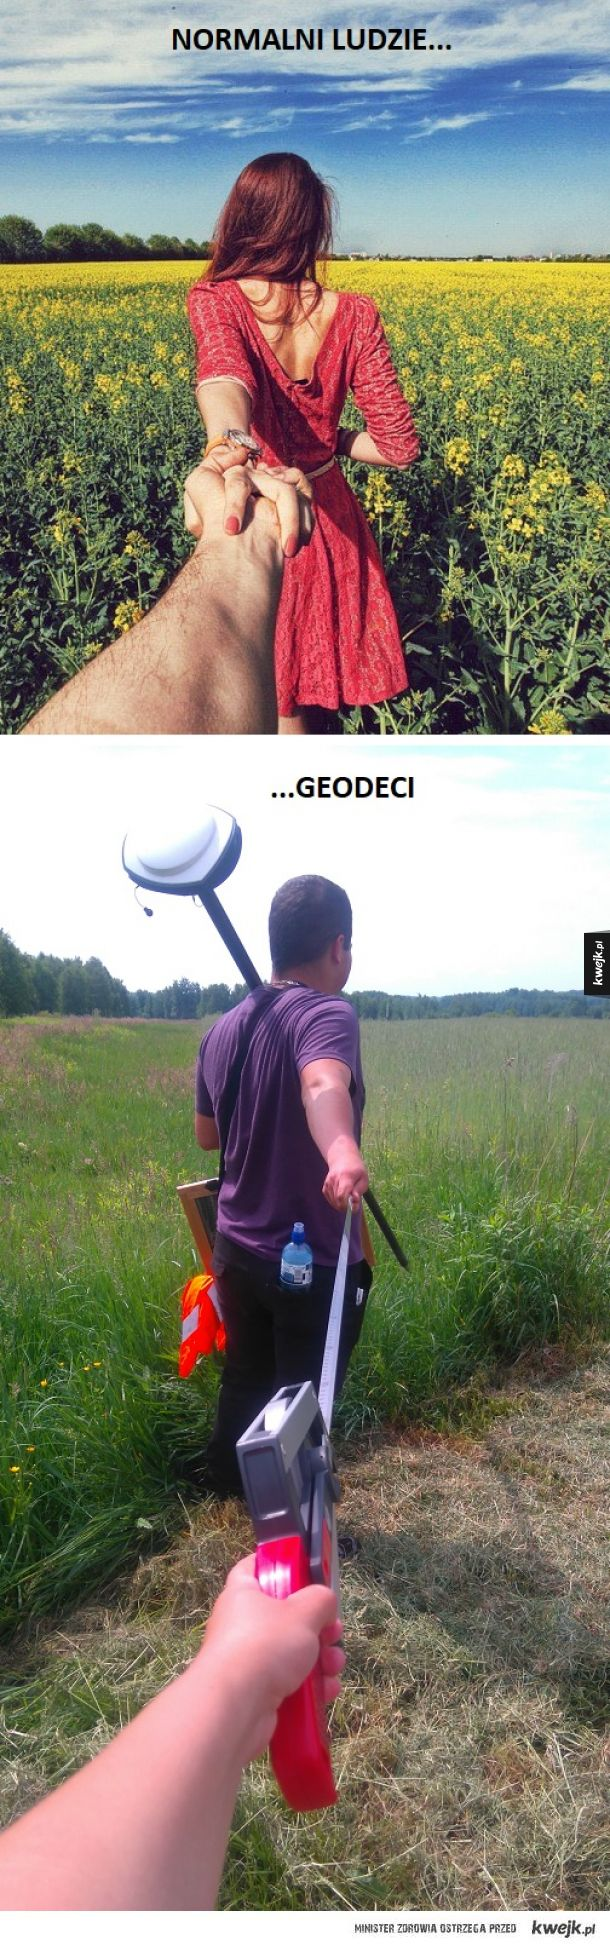 Follow to geodeta